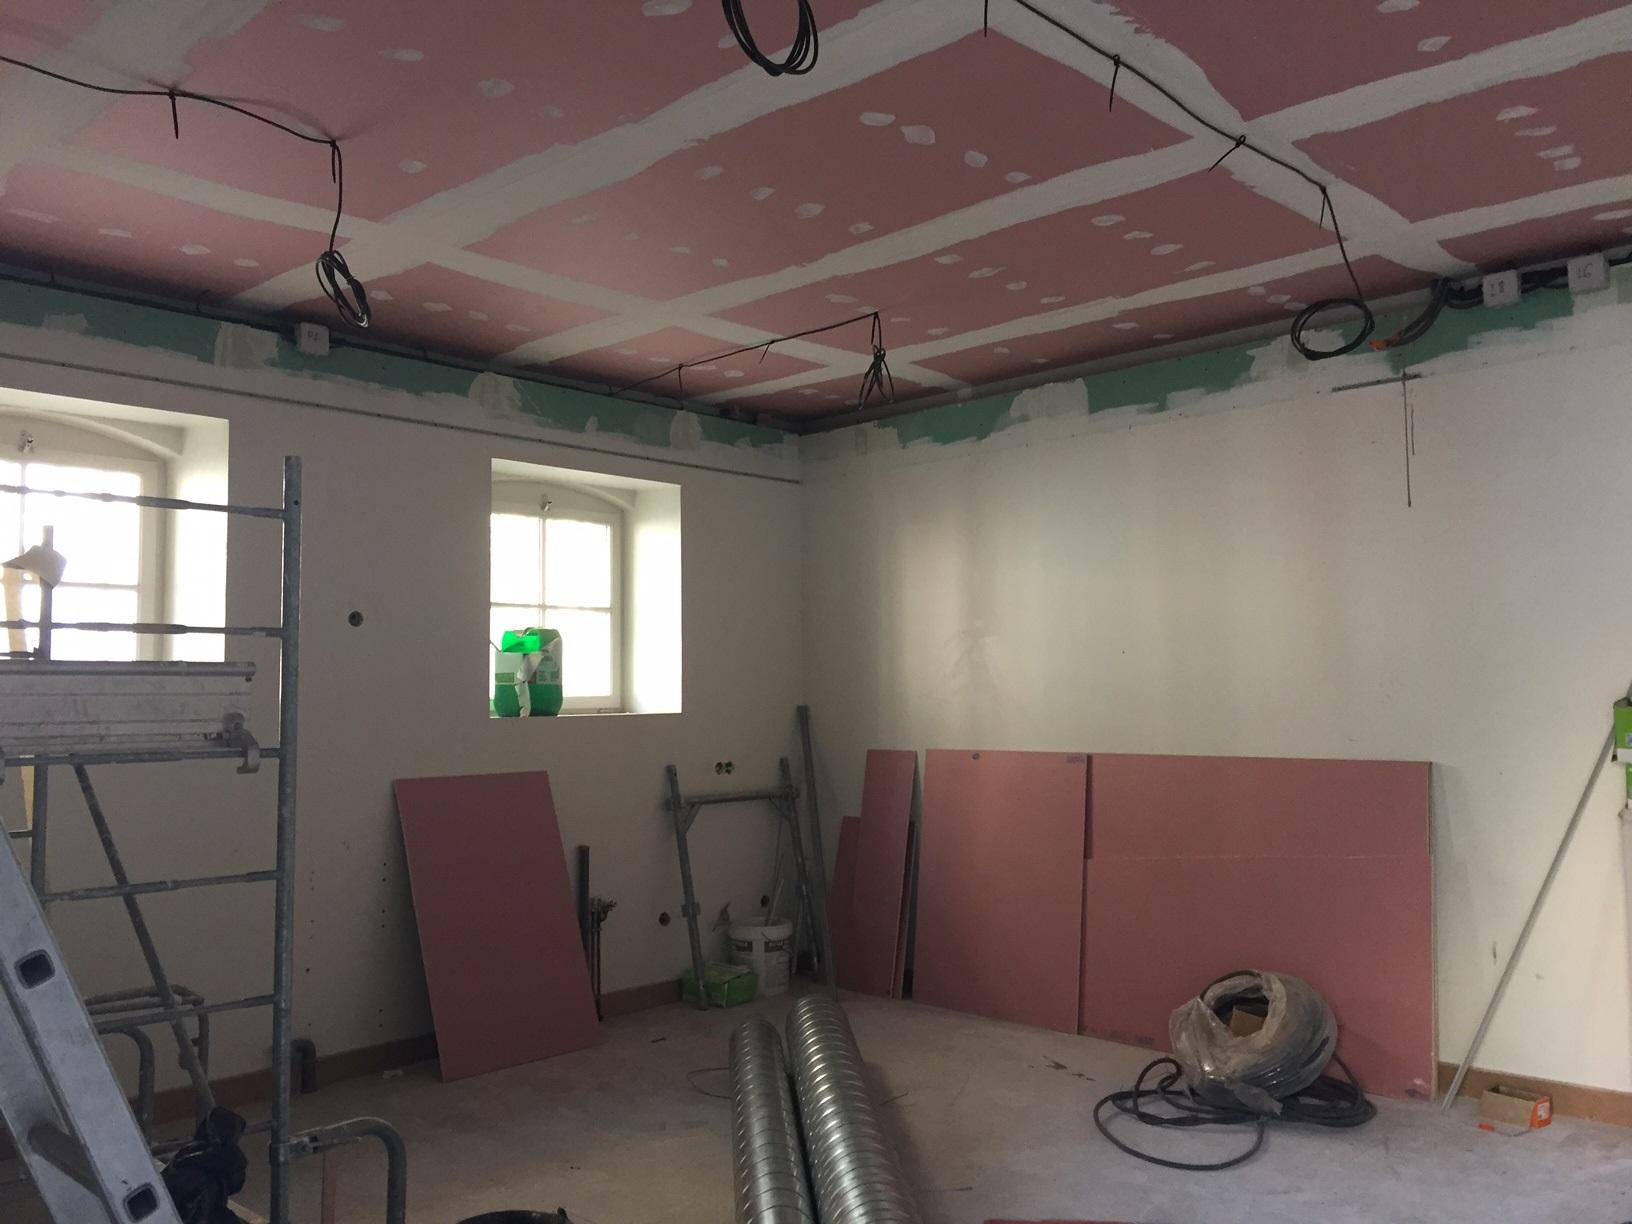 Faux Plafond Isolation Fleury Sas